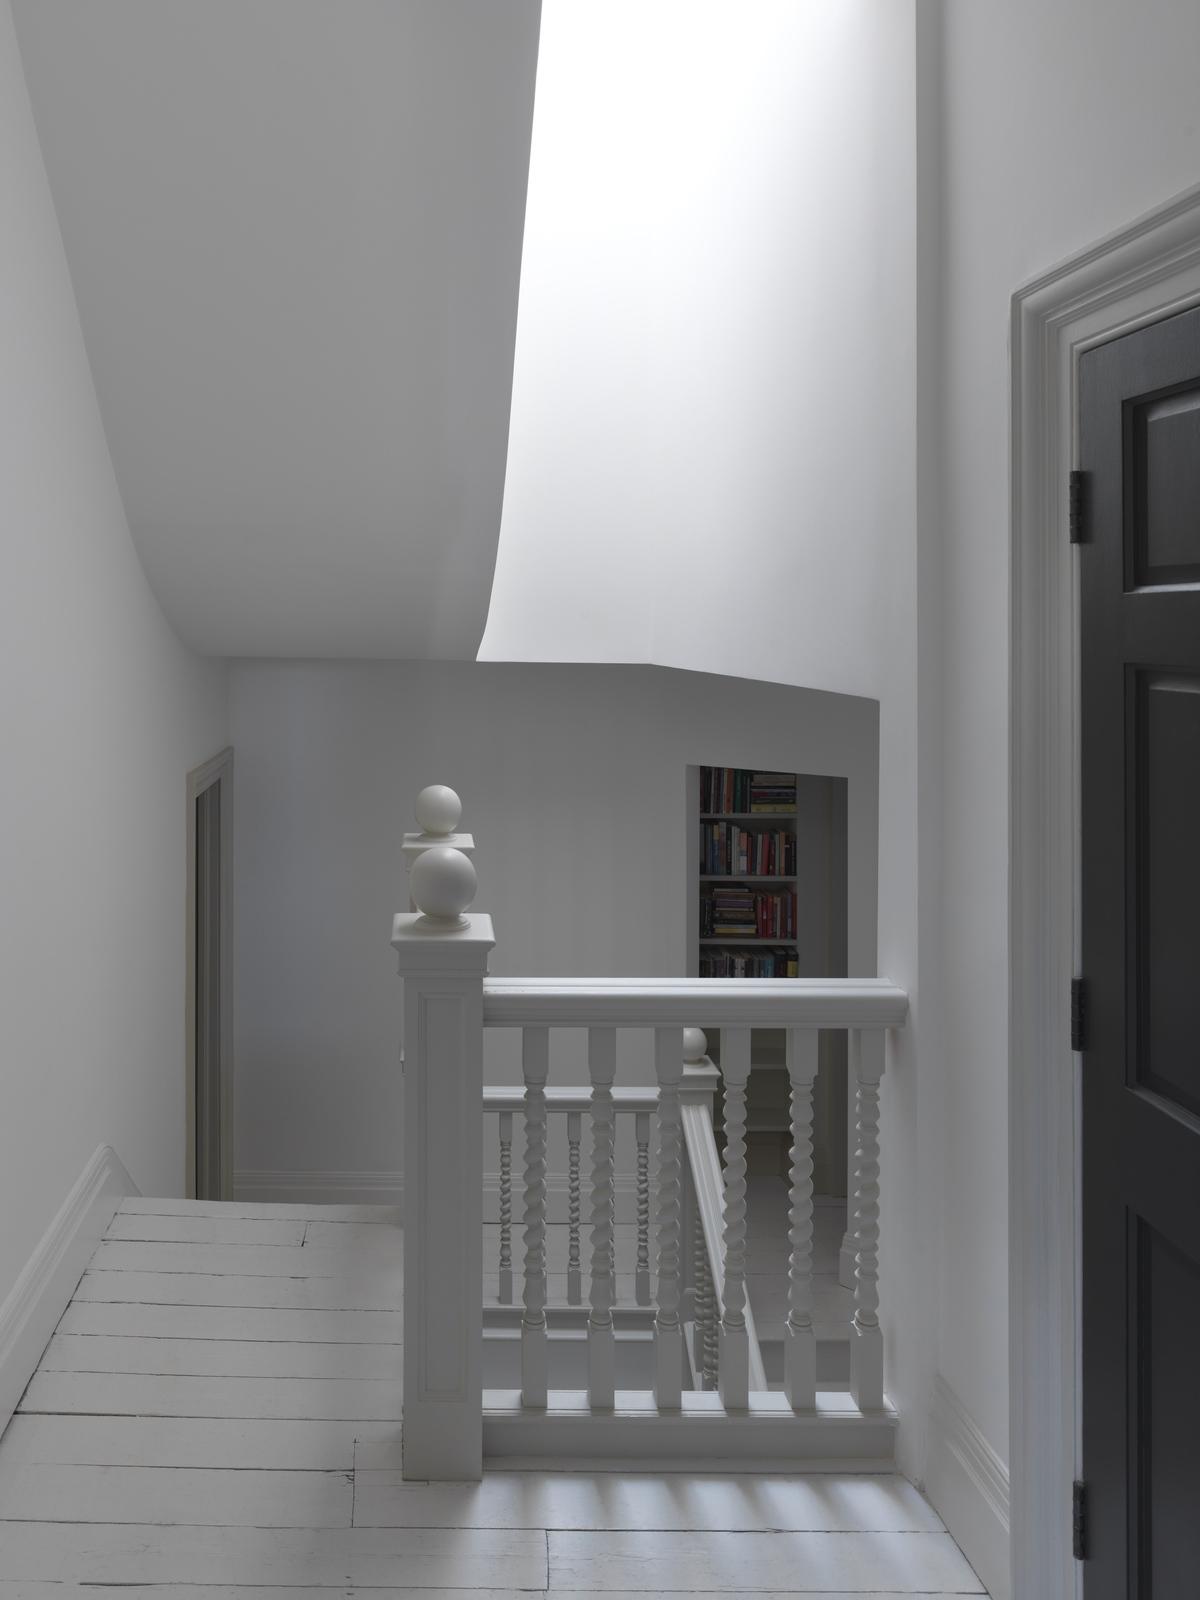 white handrail in a White House